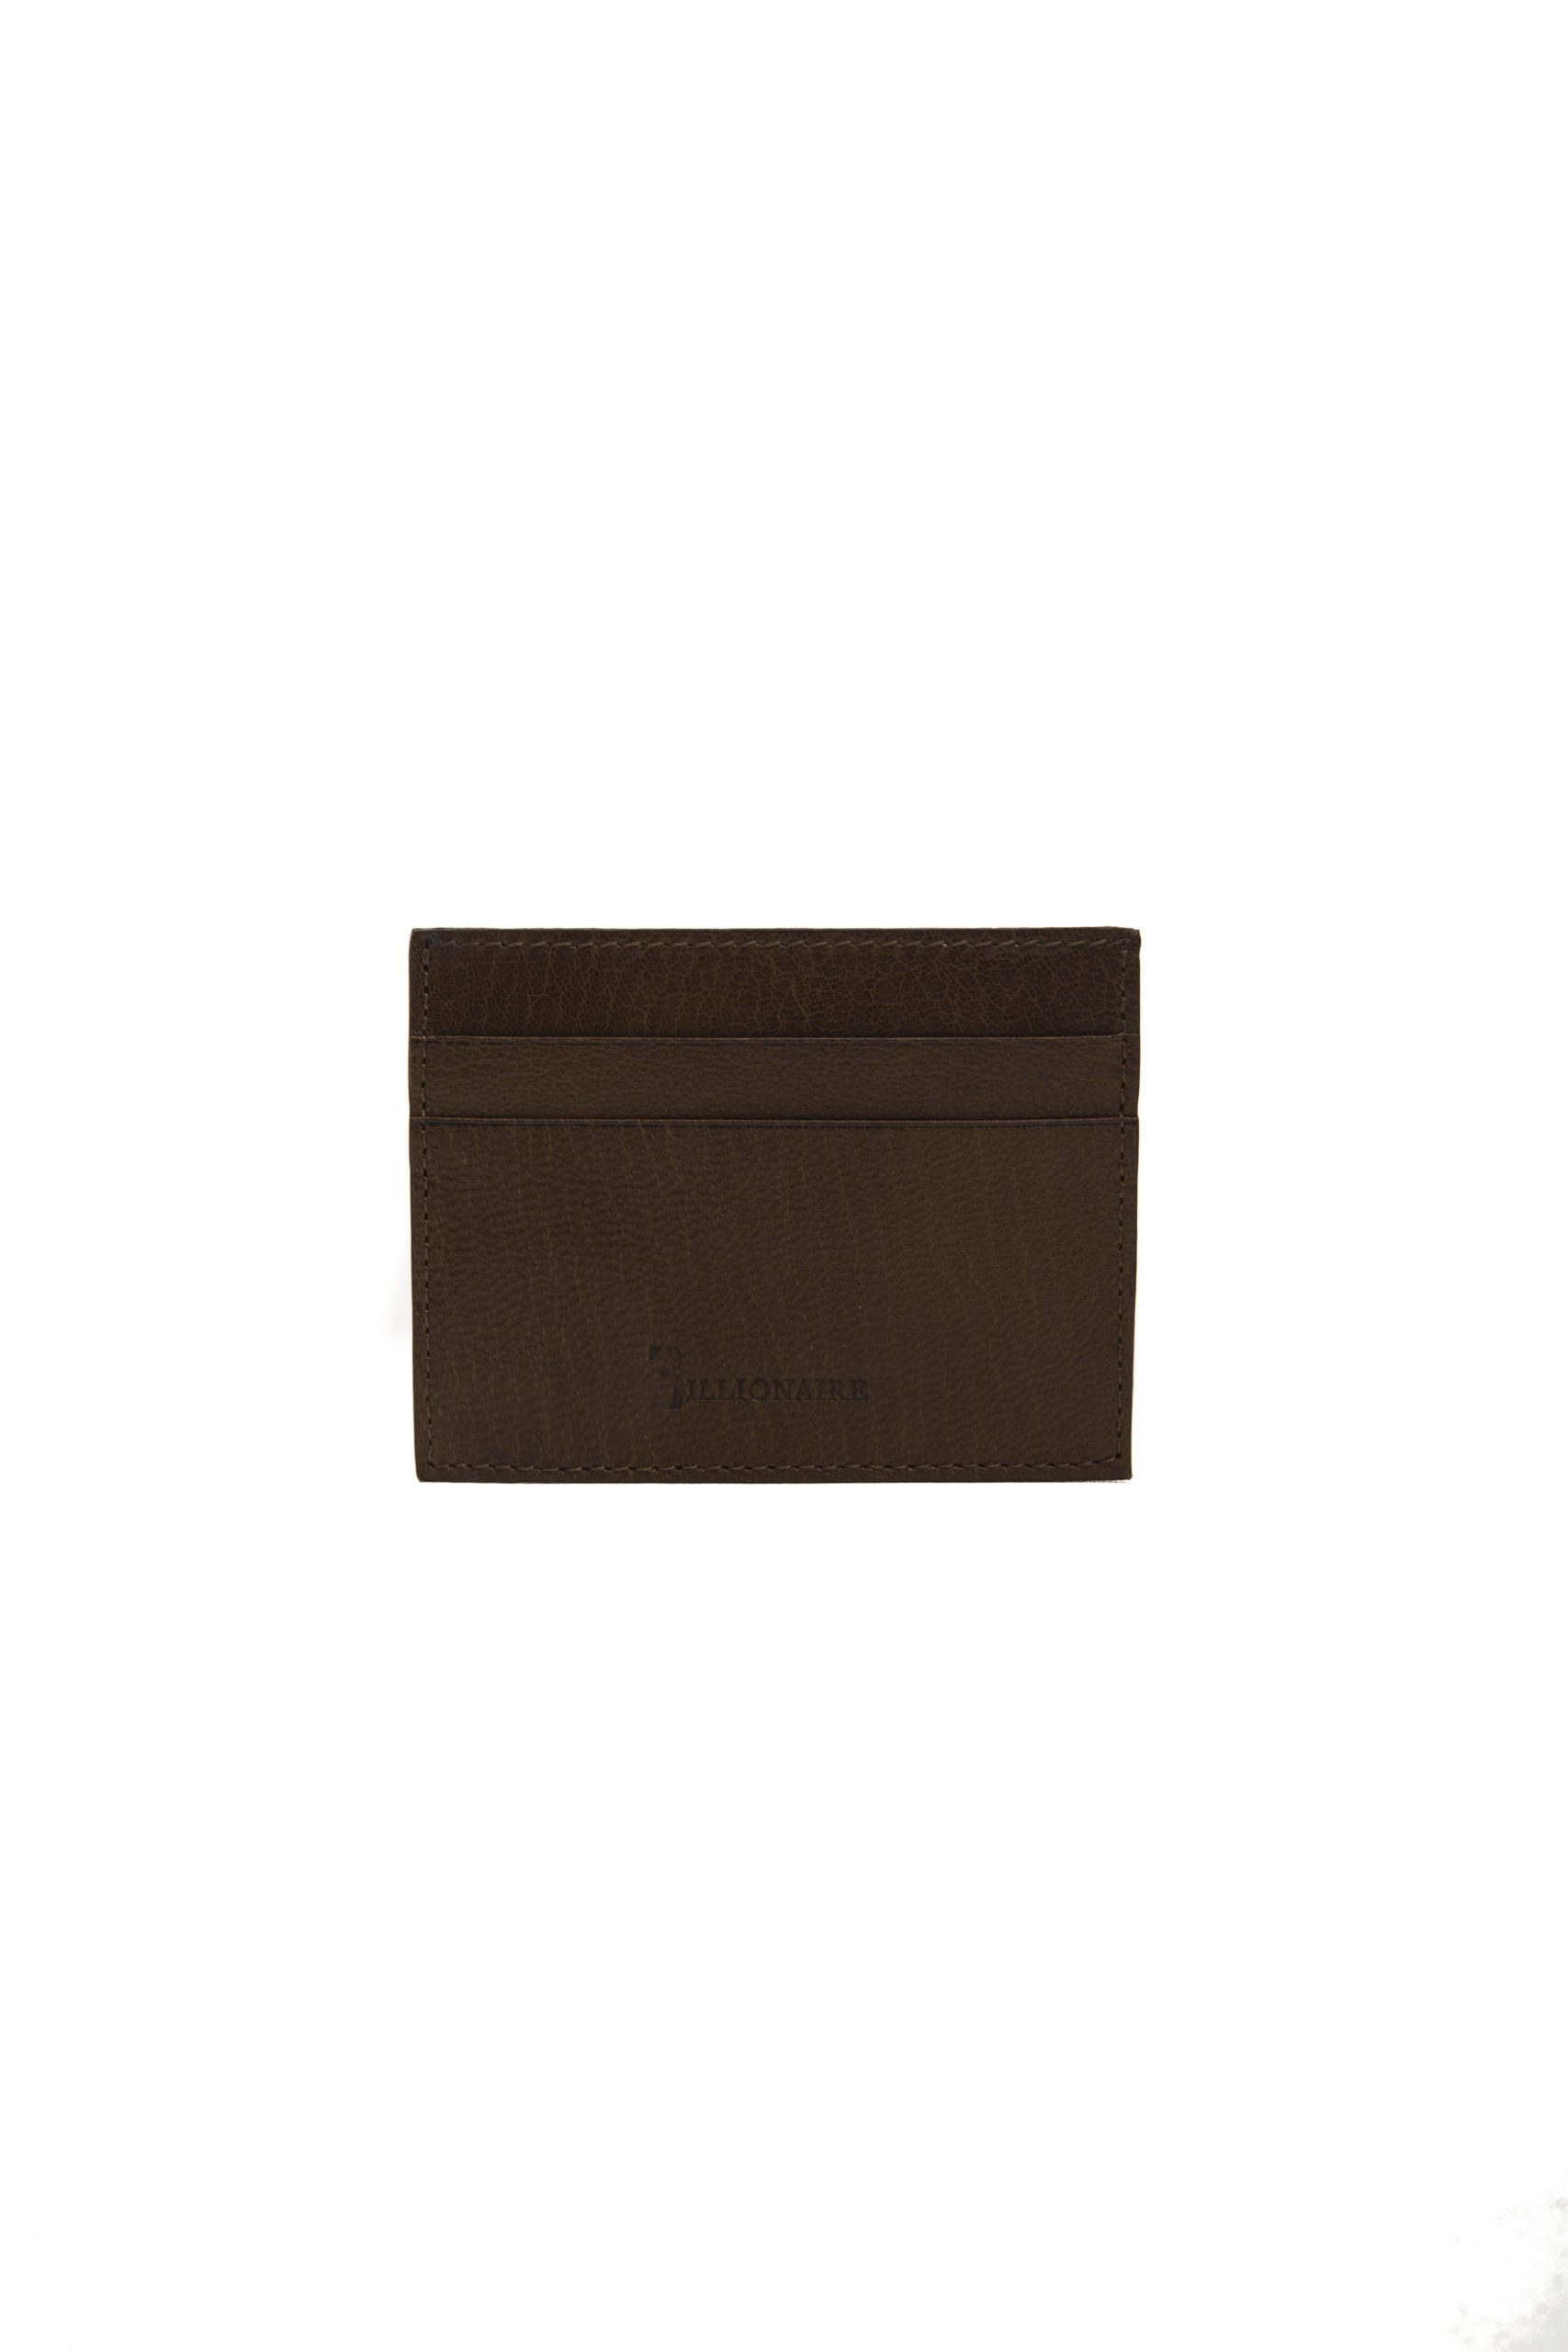 Billionaire Italian Couture Men's Wallet Brown BLC70507030_520BROWN